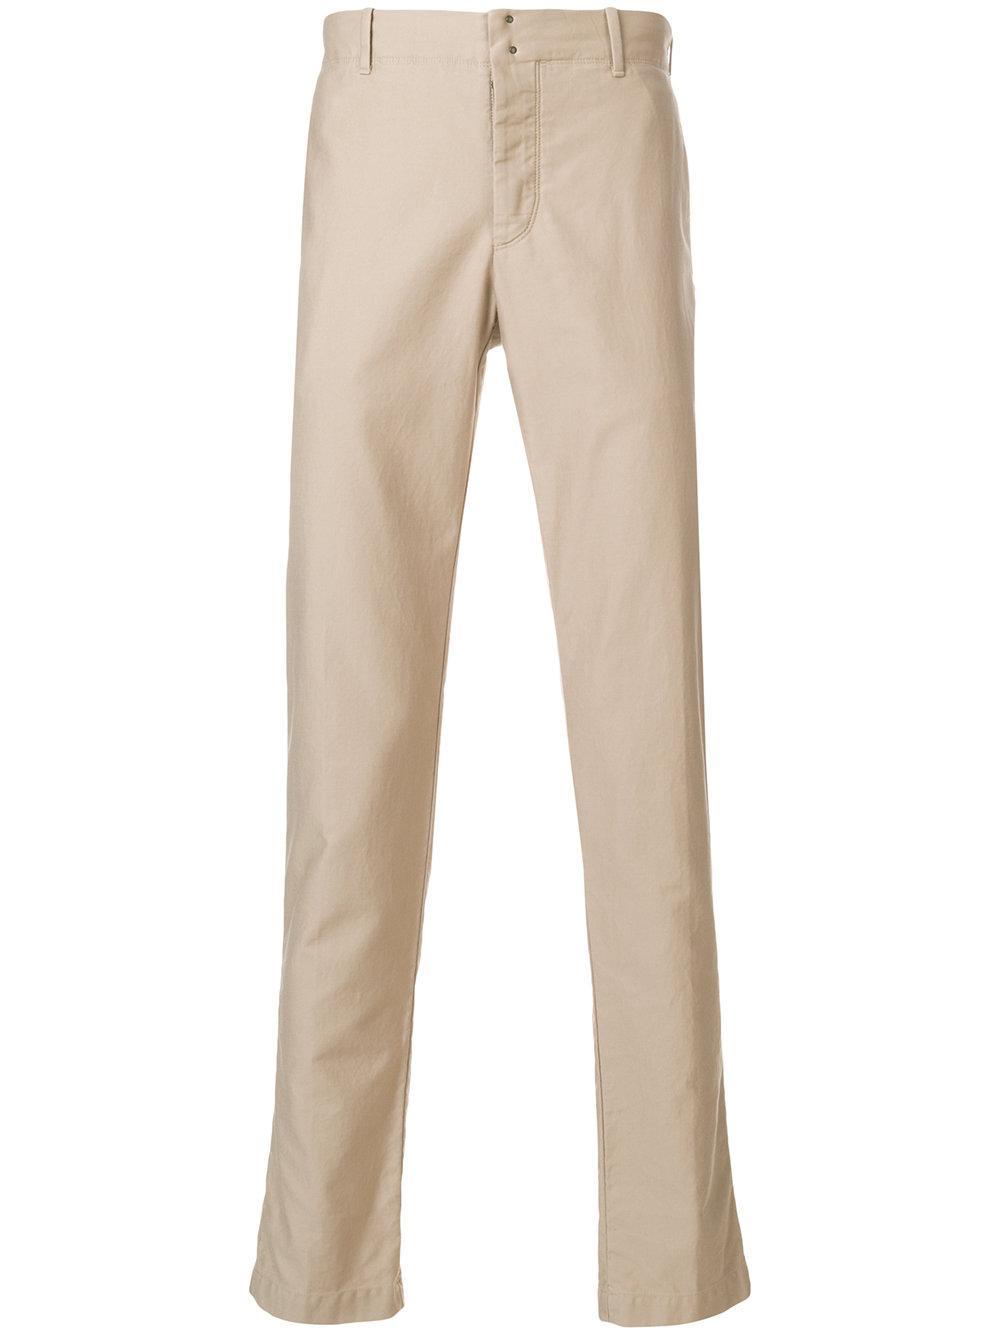 Incotex Slim Fit Trousers - Blue